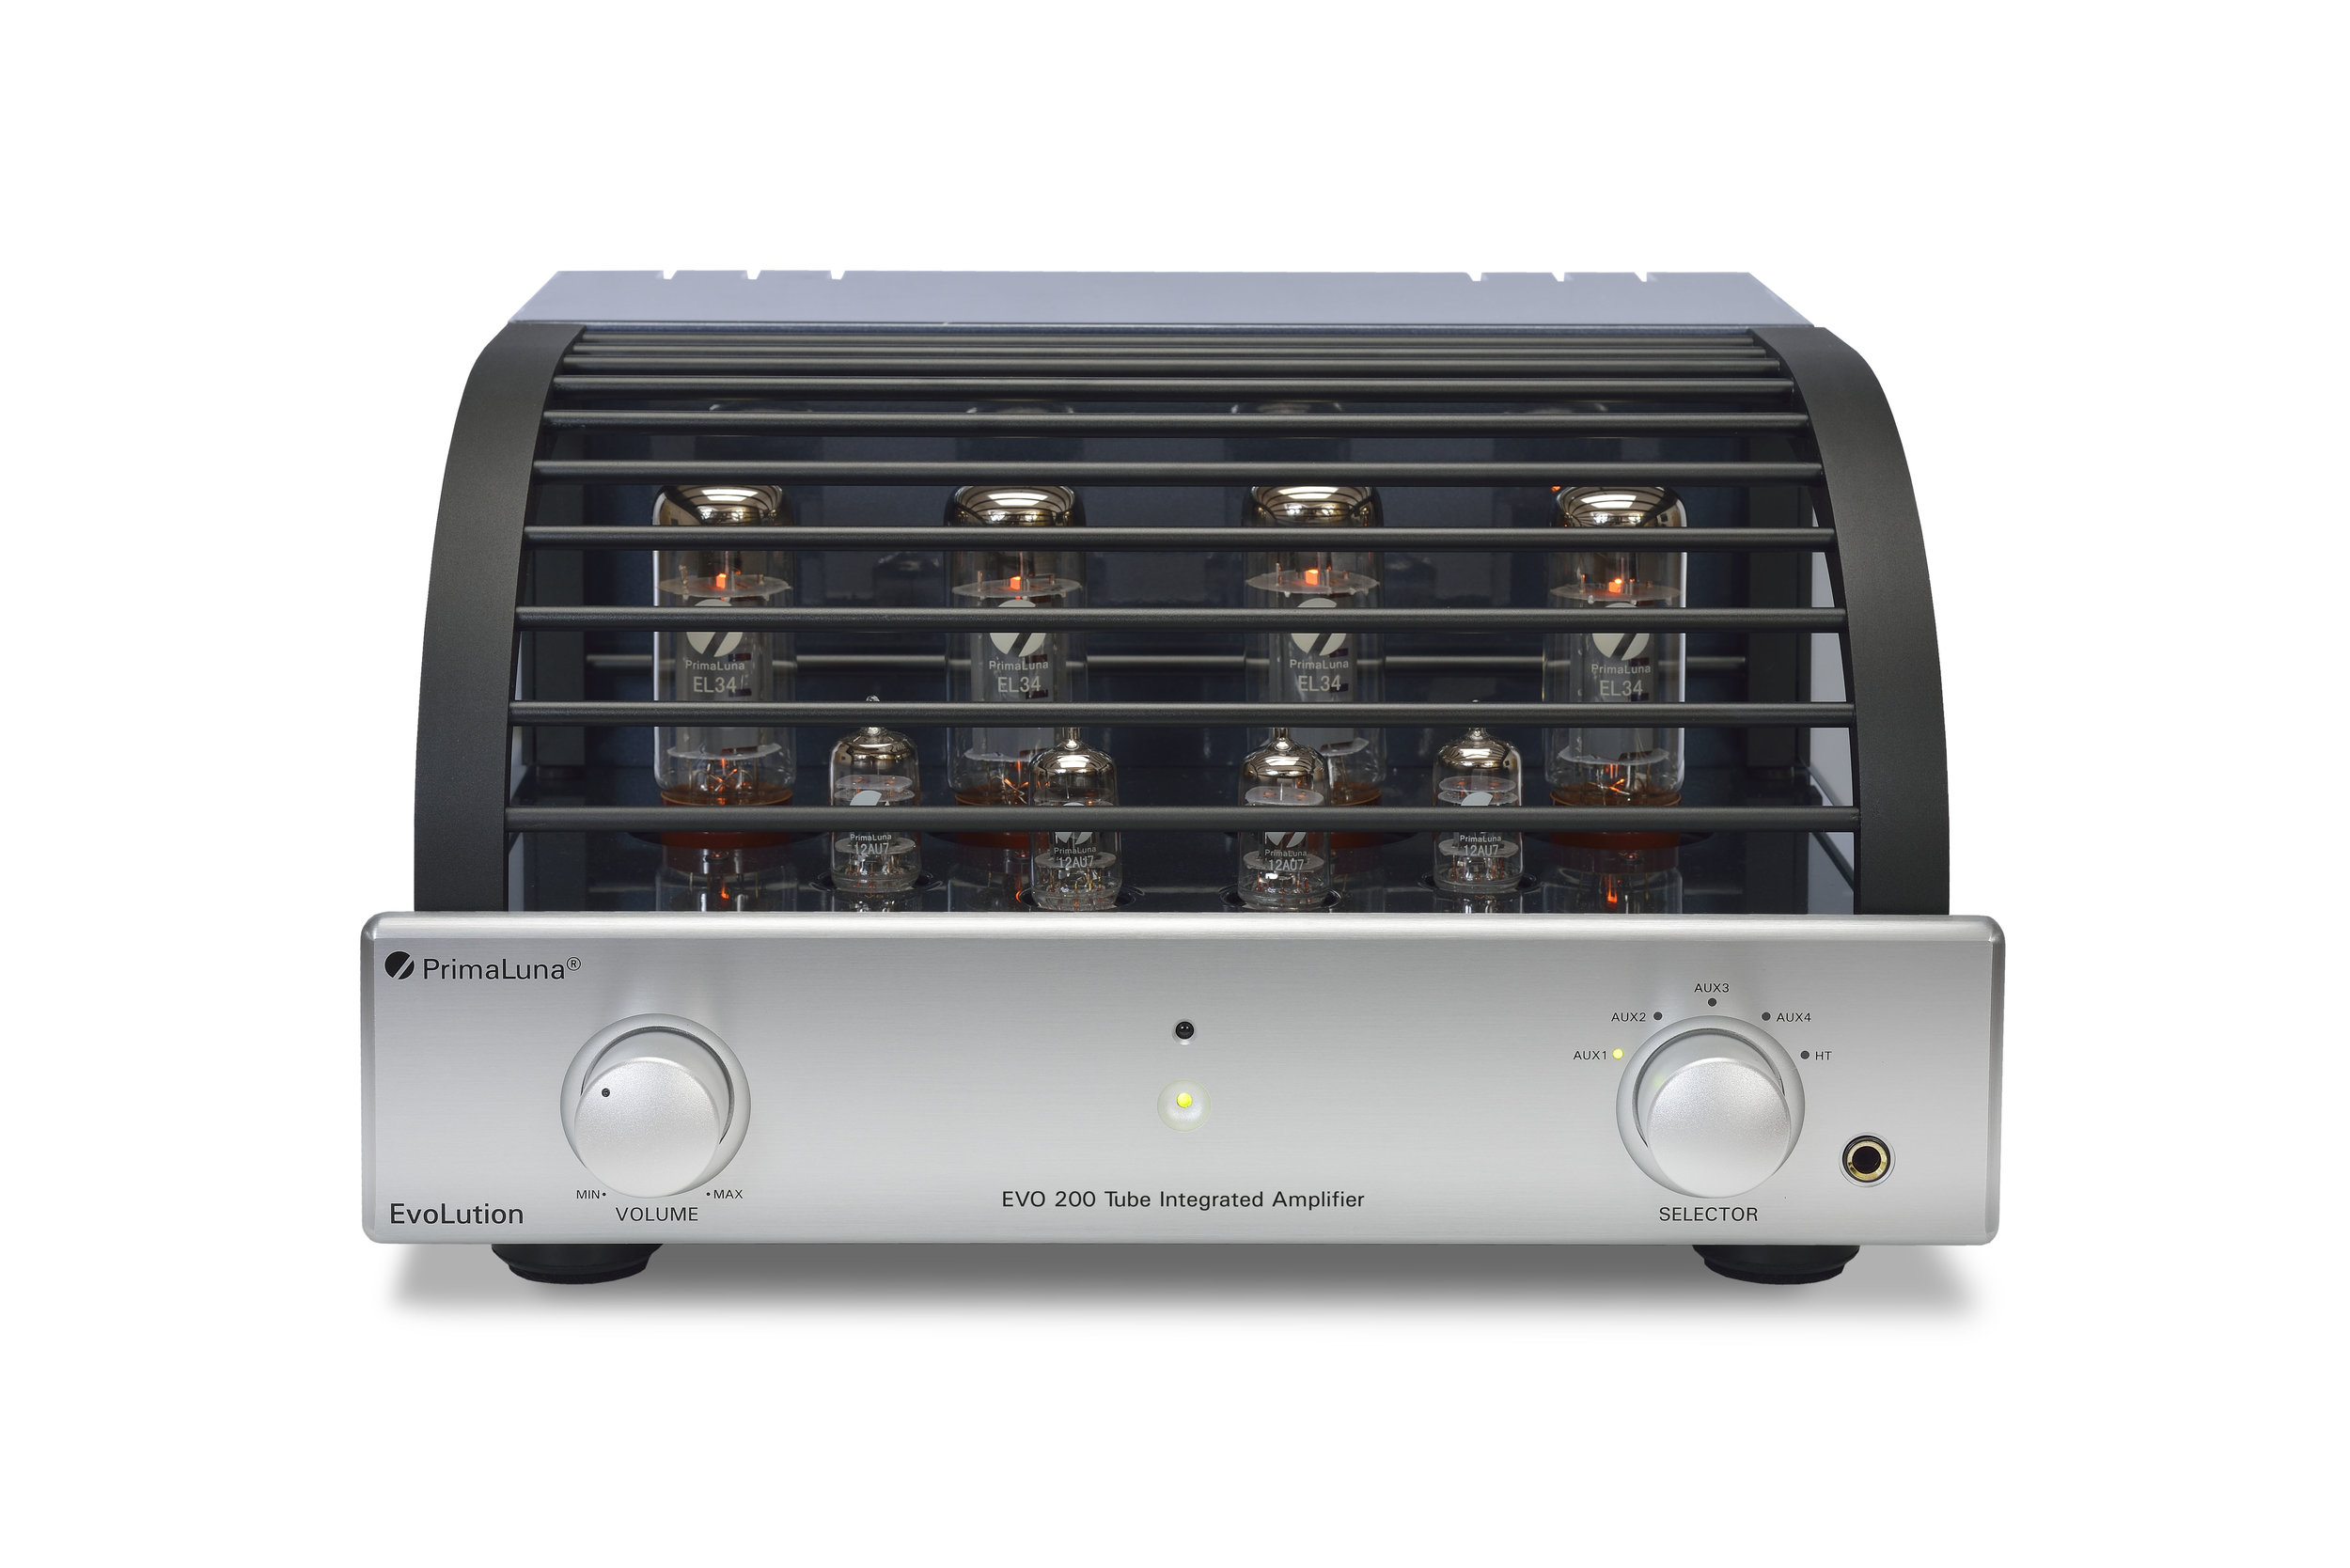 101b - PrimaLuna Evo 200 Tube Integrated Amplifier - silver - front - white background.jpg